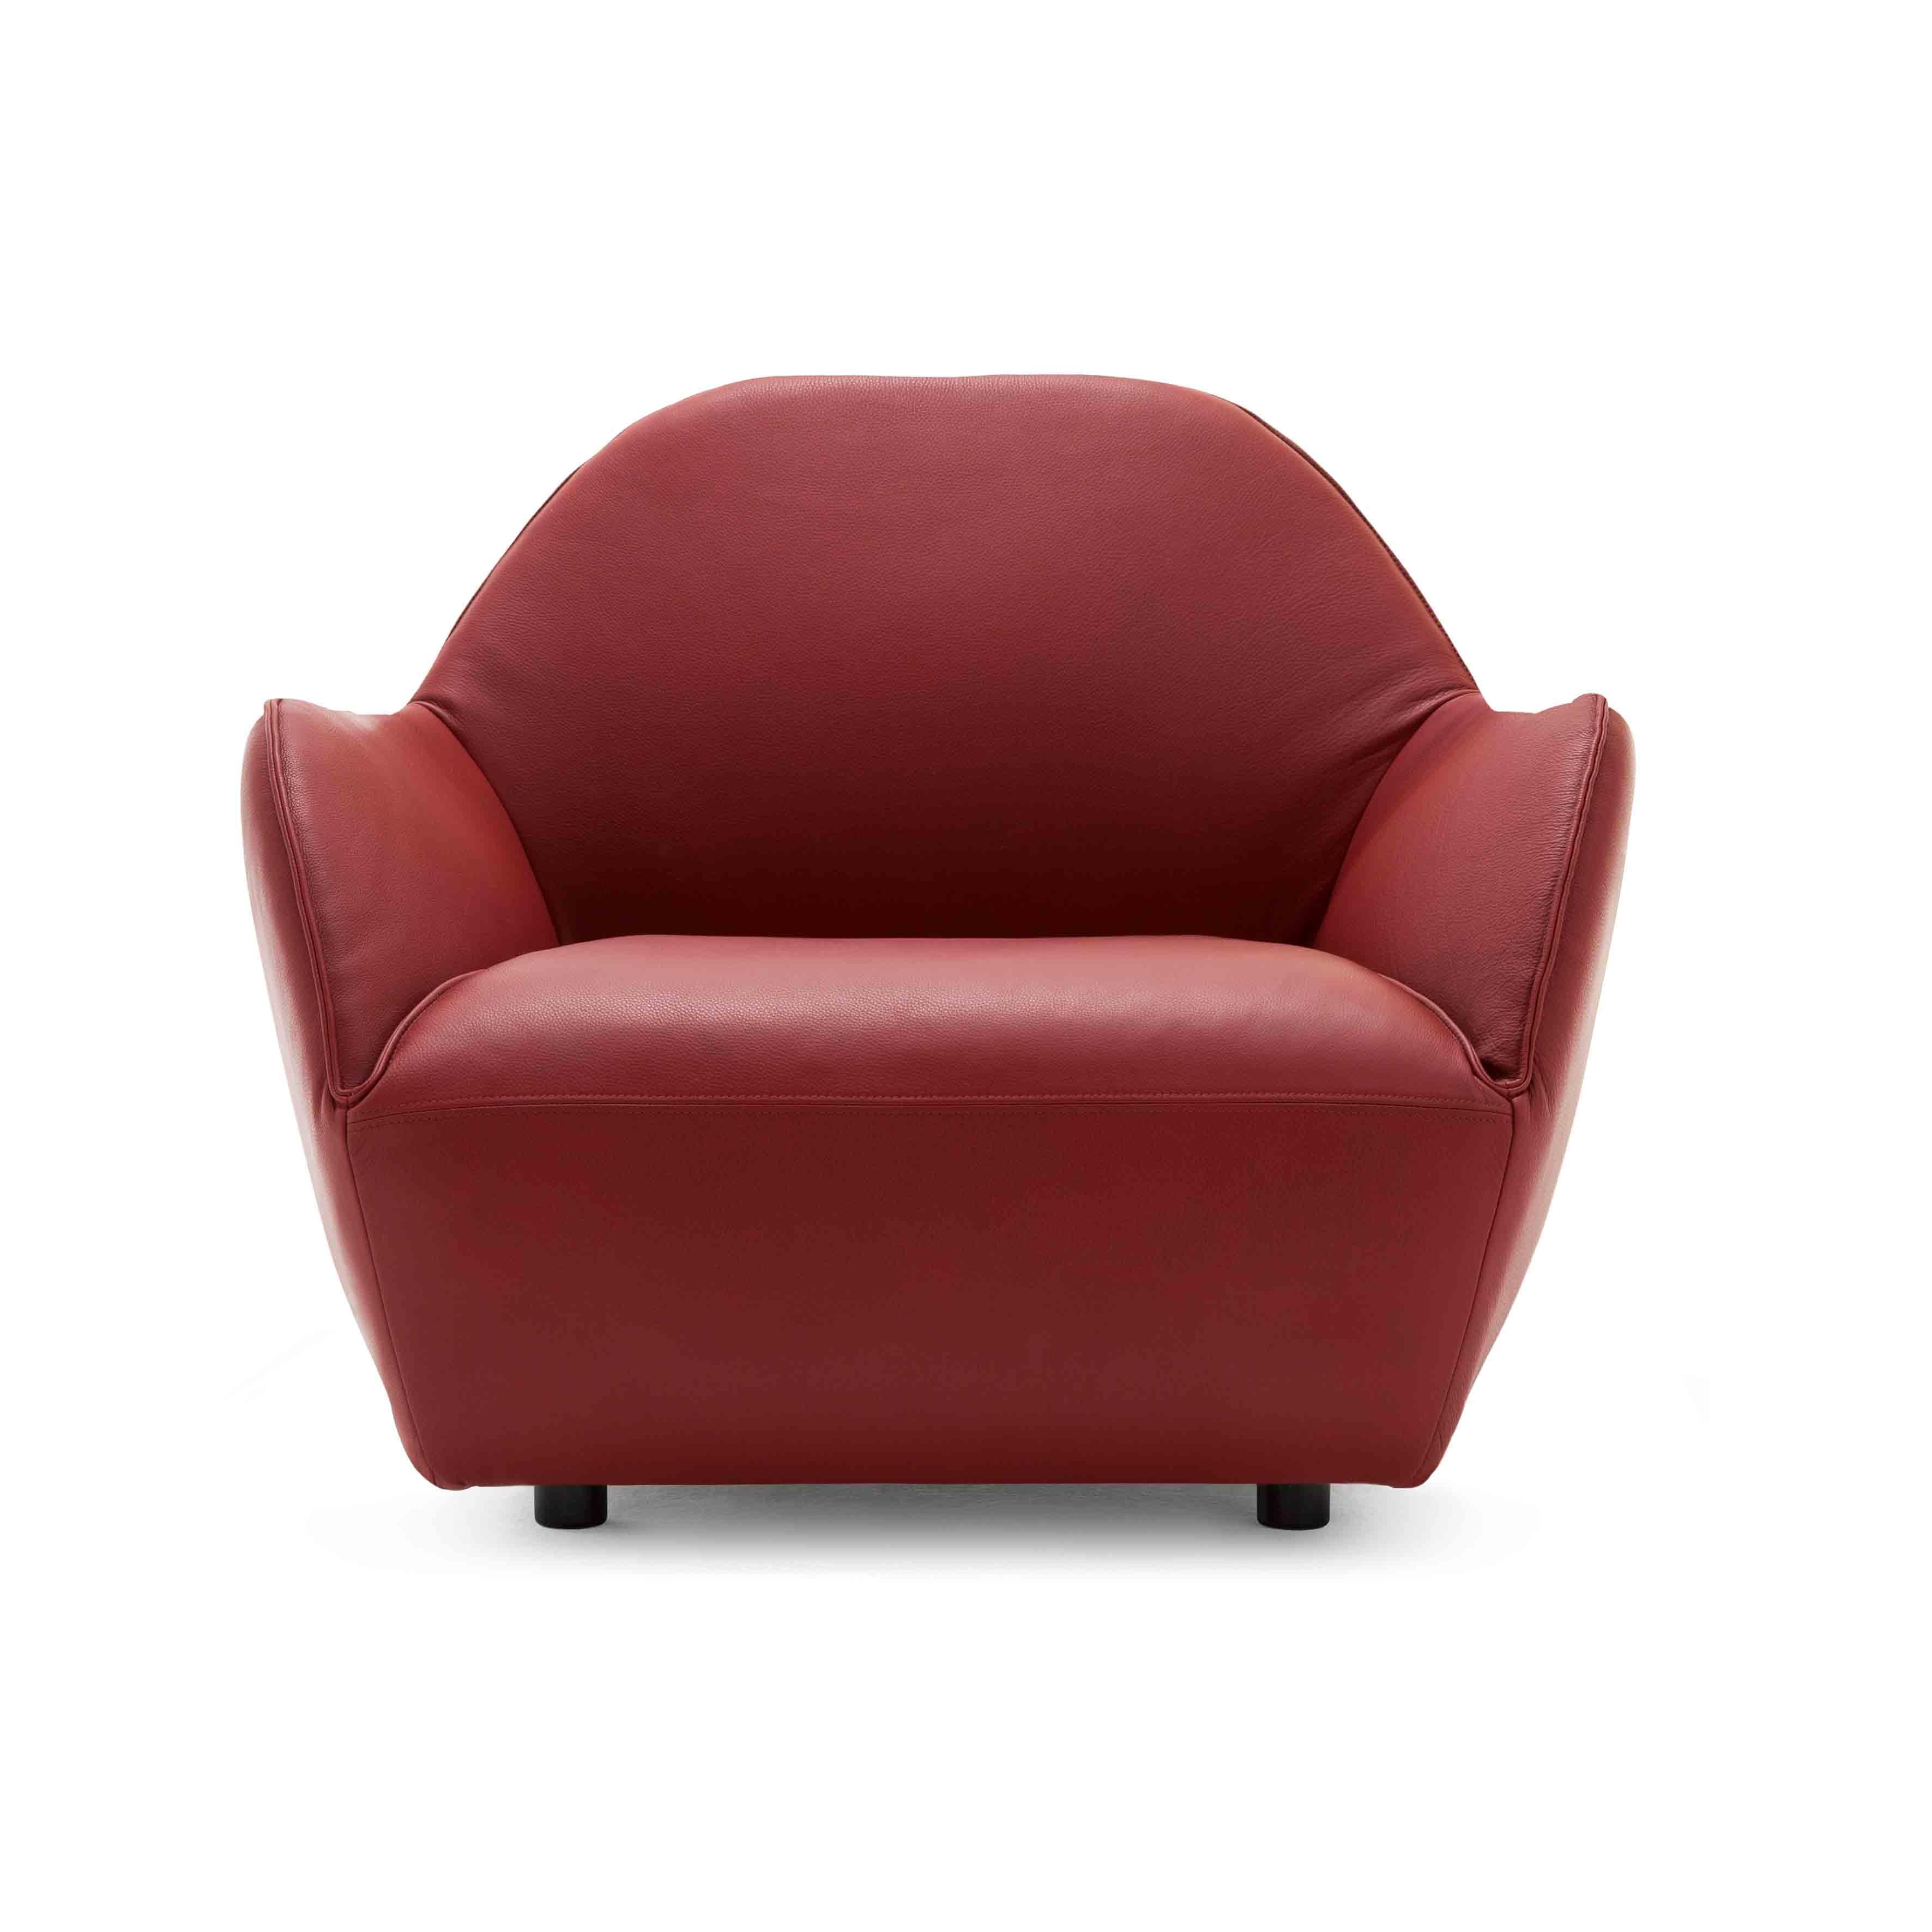 sessel von h lsta designed by joachim nees auf. Black Bedroom Furniture Sets. Home Design Ideas